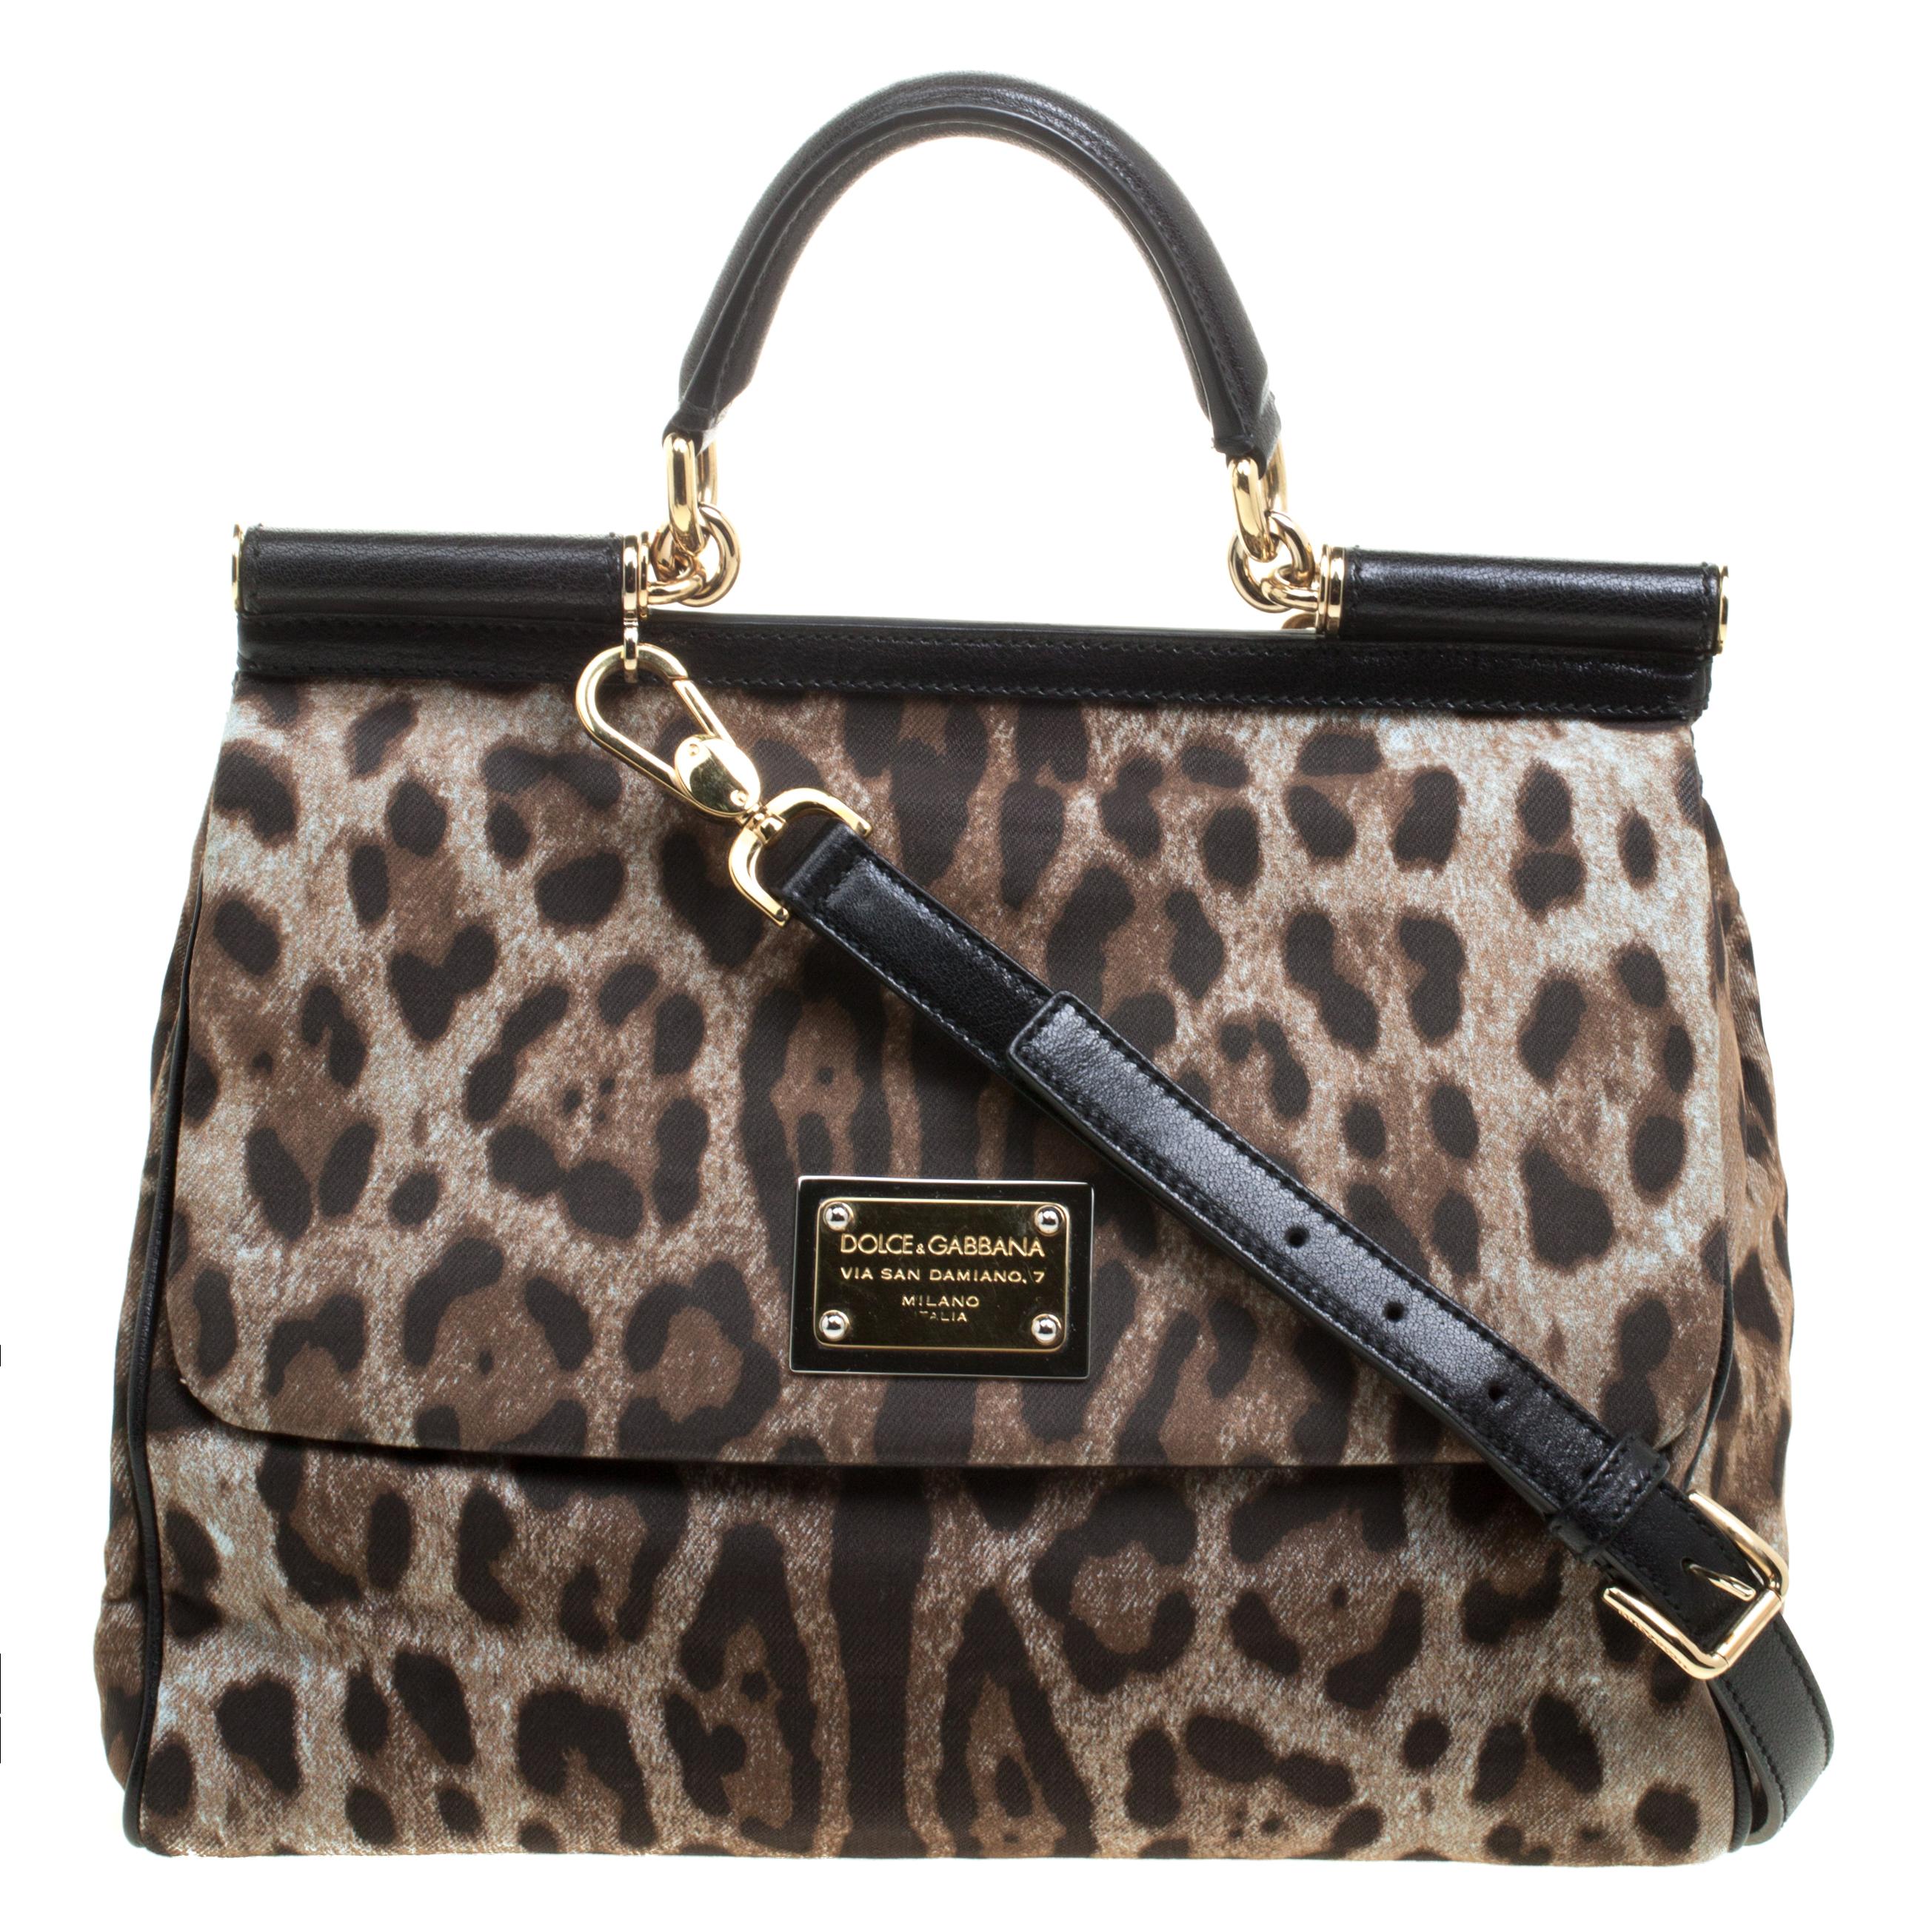 1ff0927b68eb Buy Dolce and Gabbana Leopard Print Fabric Medium Miss Sicily Top ...